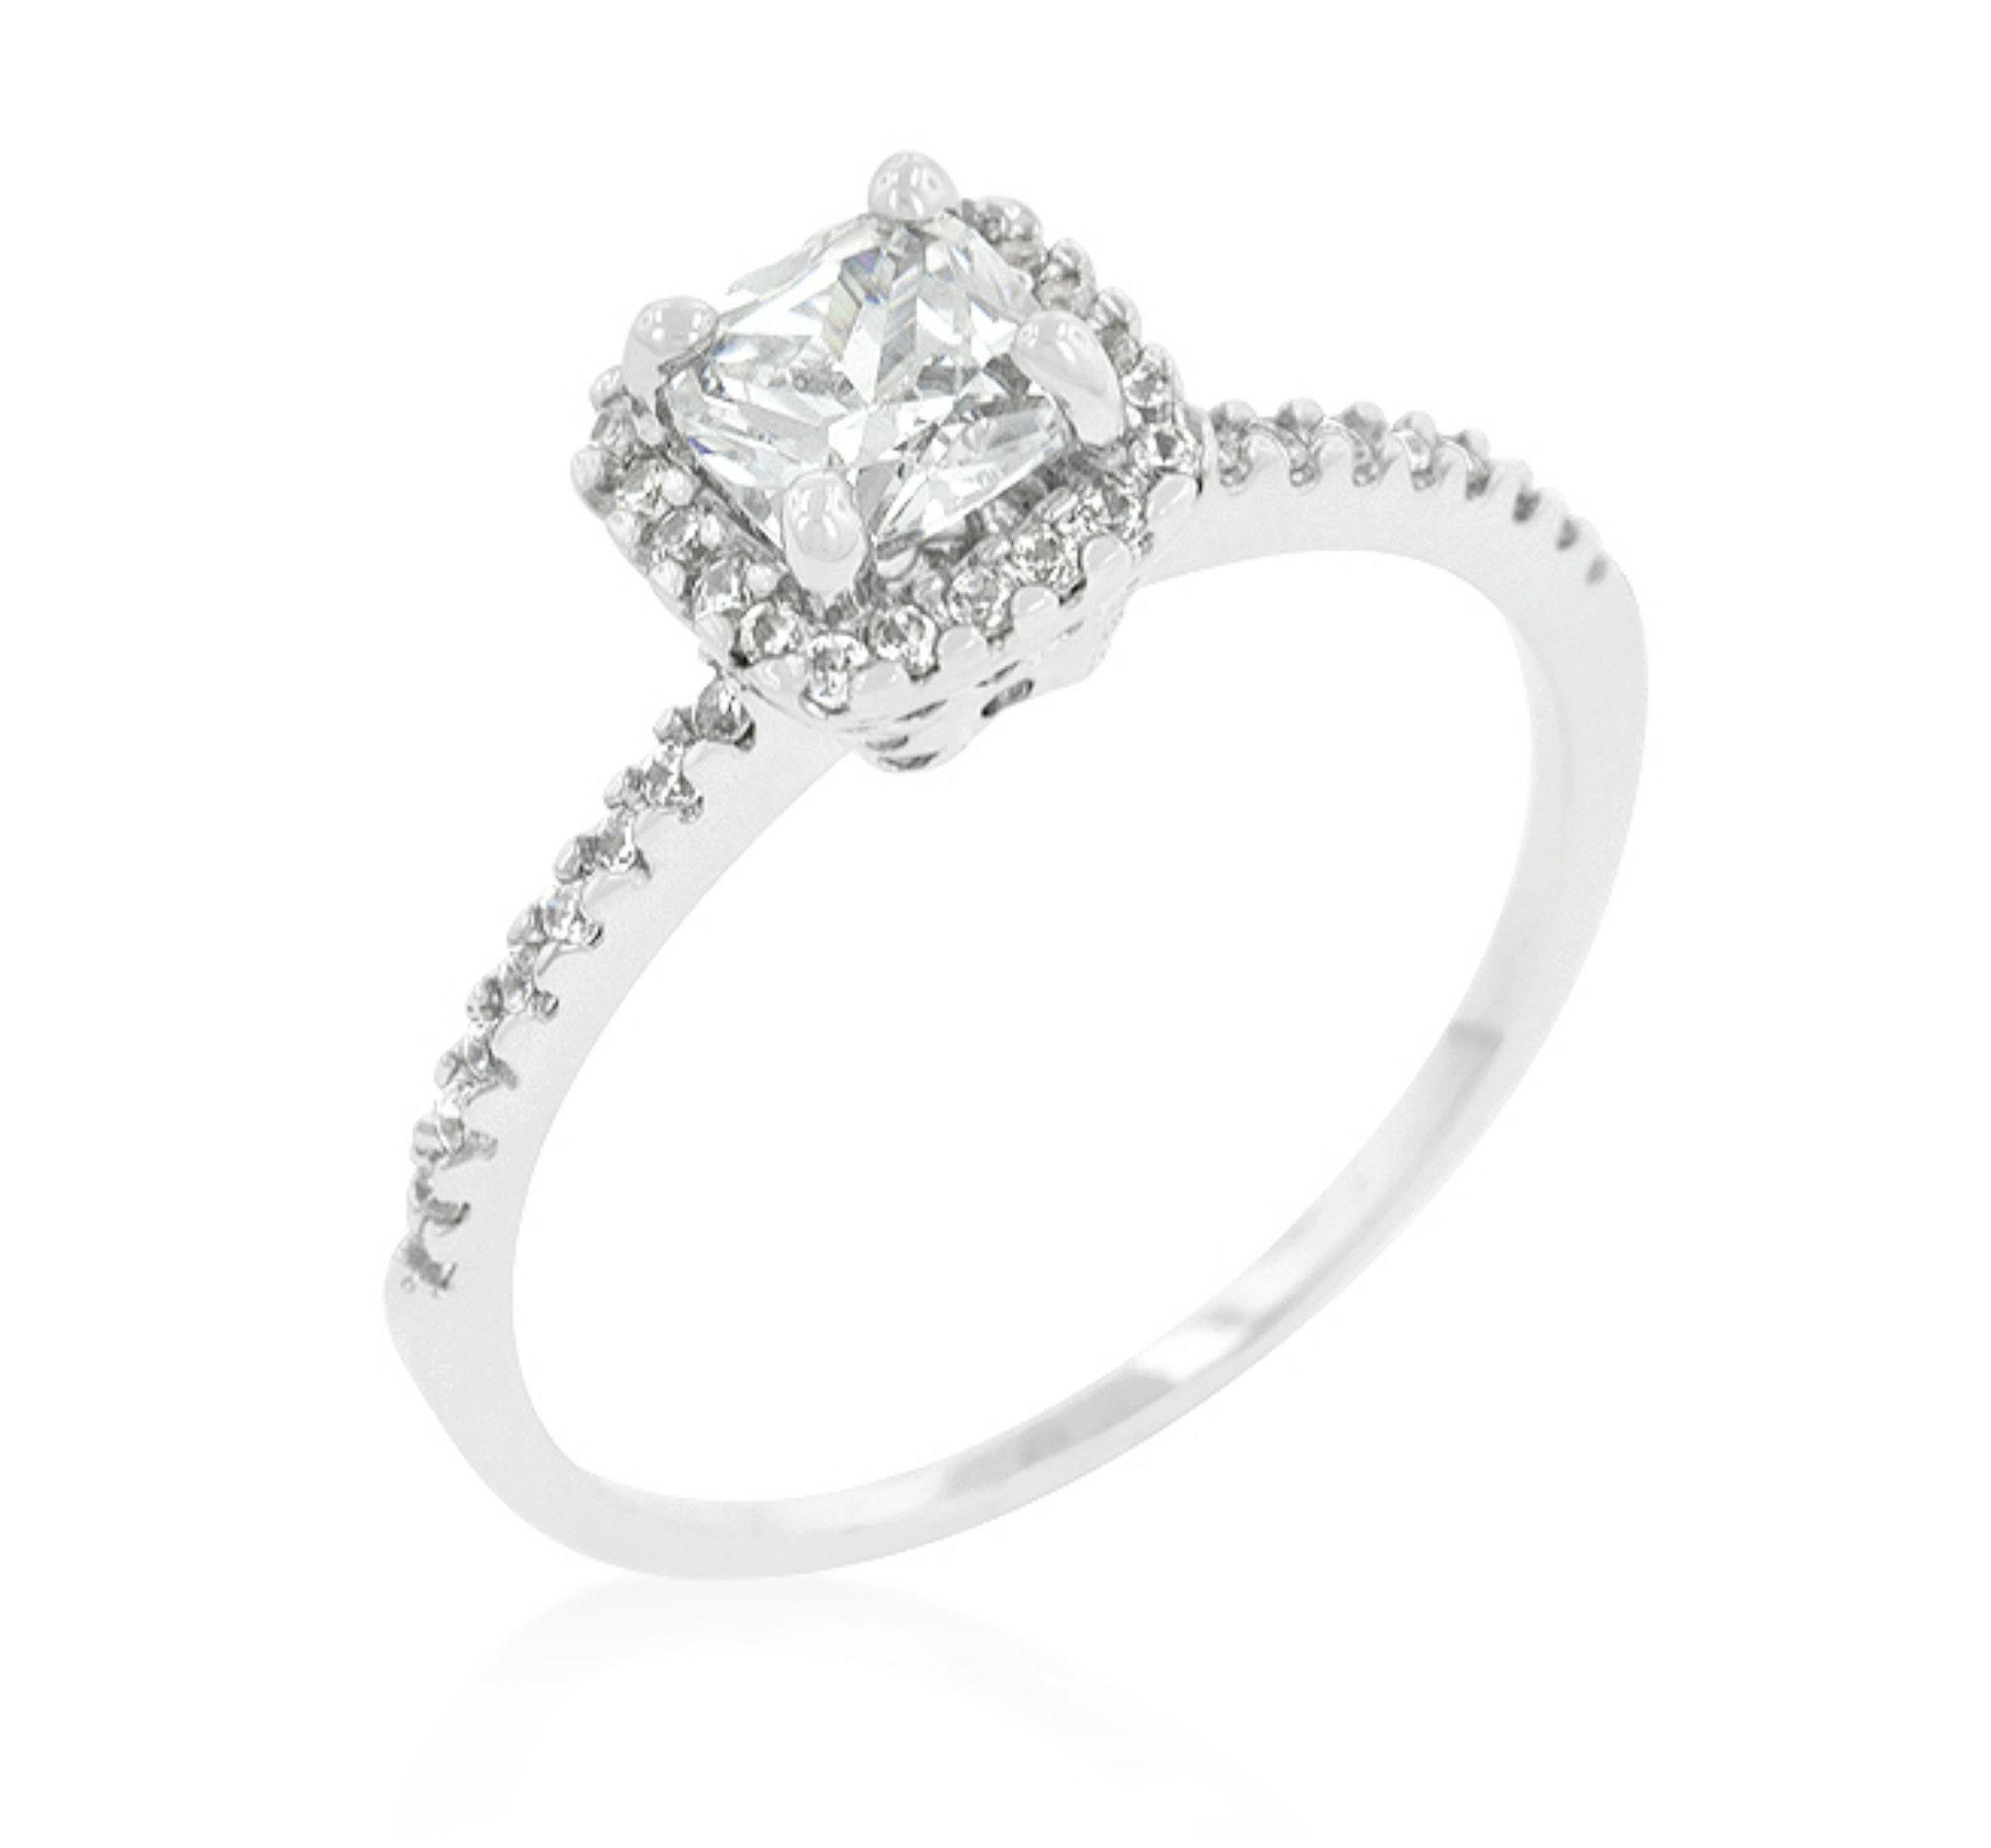 Ada Delicate Princess Cut Halo Engagement Ring 1 25 ct